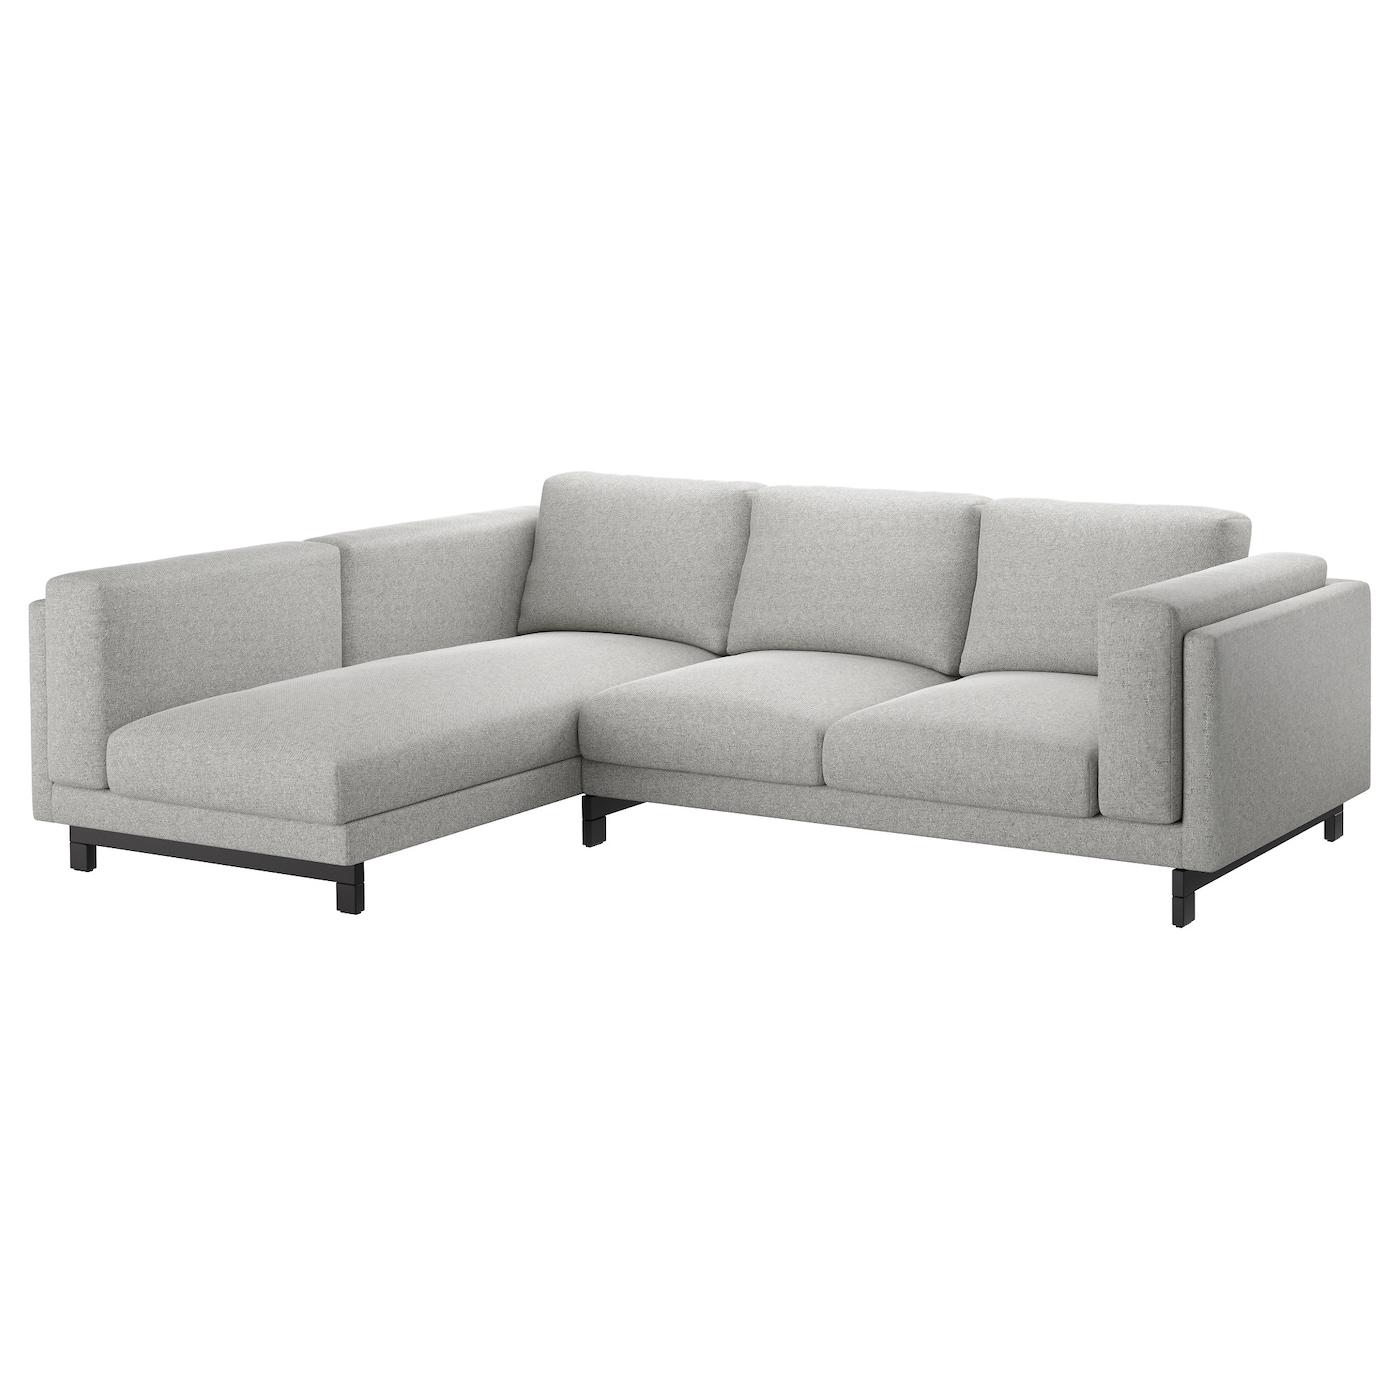 nockeby canap 3 places avec m ridienne gauche tallmyra blanc noir bois ikea. Black Bedroom Furniture Sets. Home Design Ideas